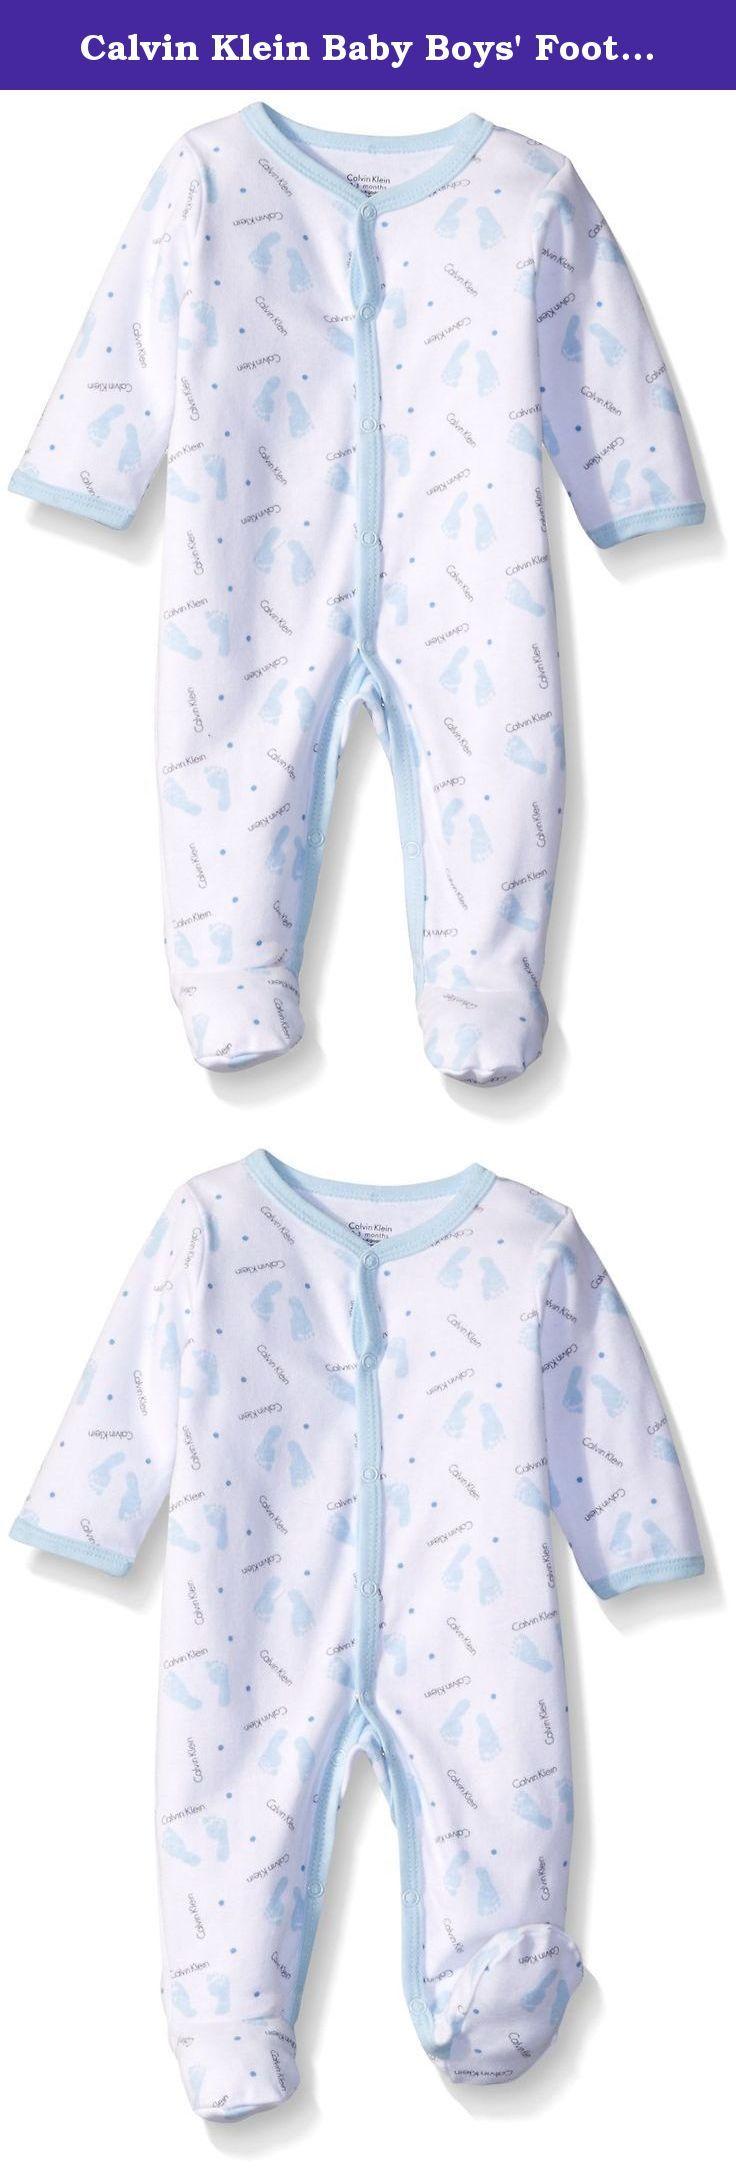 Calvin Klein Baby Boys Footprint Sleeper Blue 3 6 Month Baby Boy Baby Blanket Sleeper